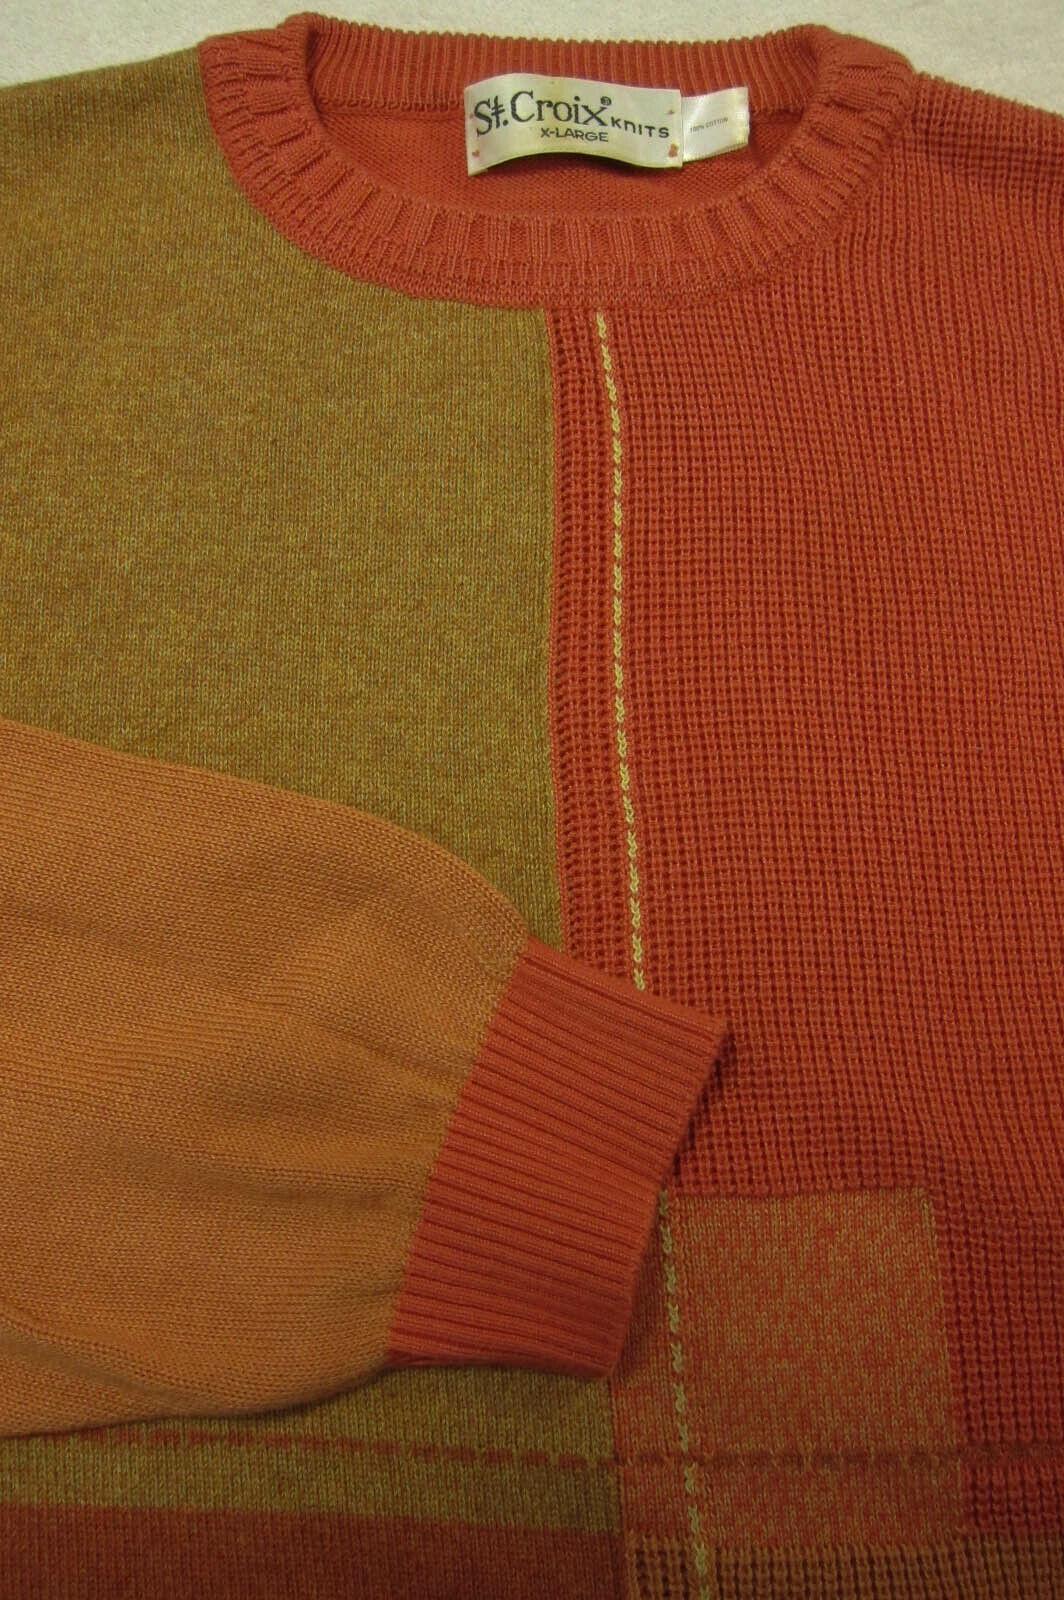 NEW  St. Croix Knits orange Tan Cotton Abstract Geometric Crew Sweater XL